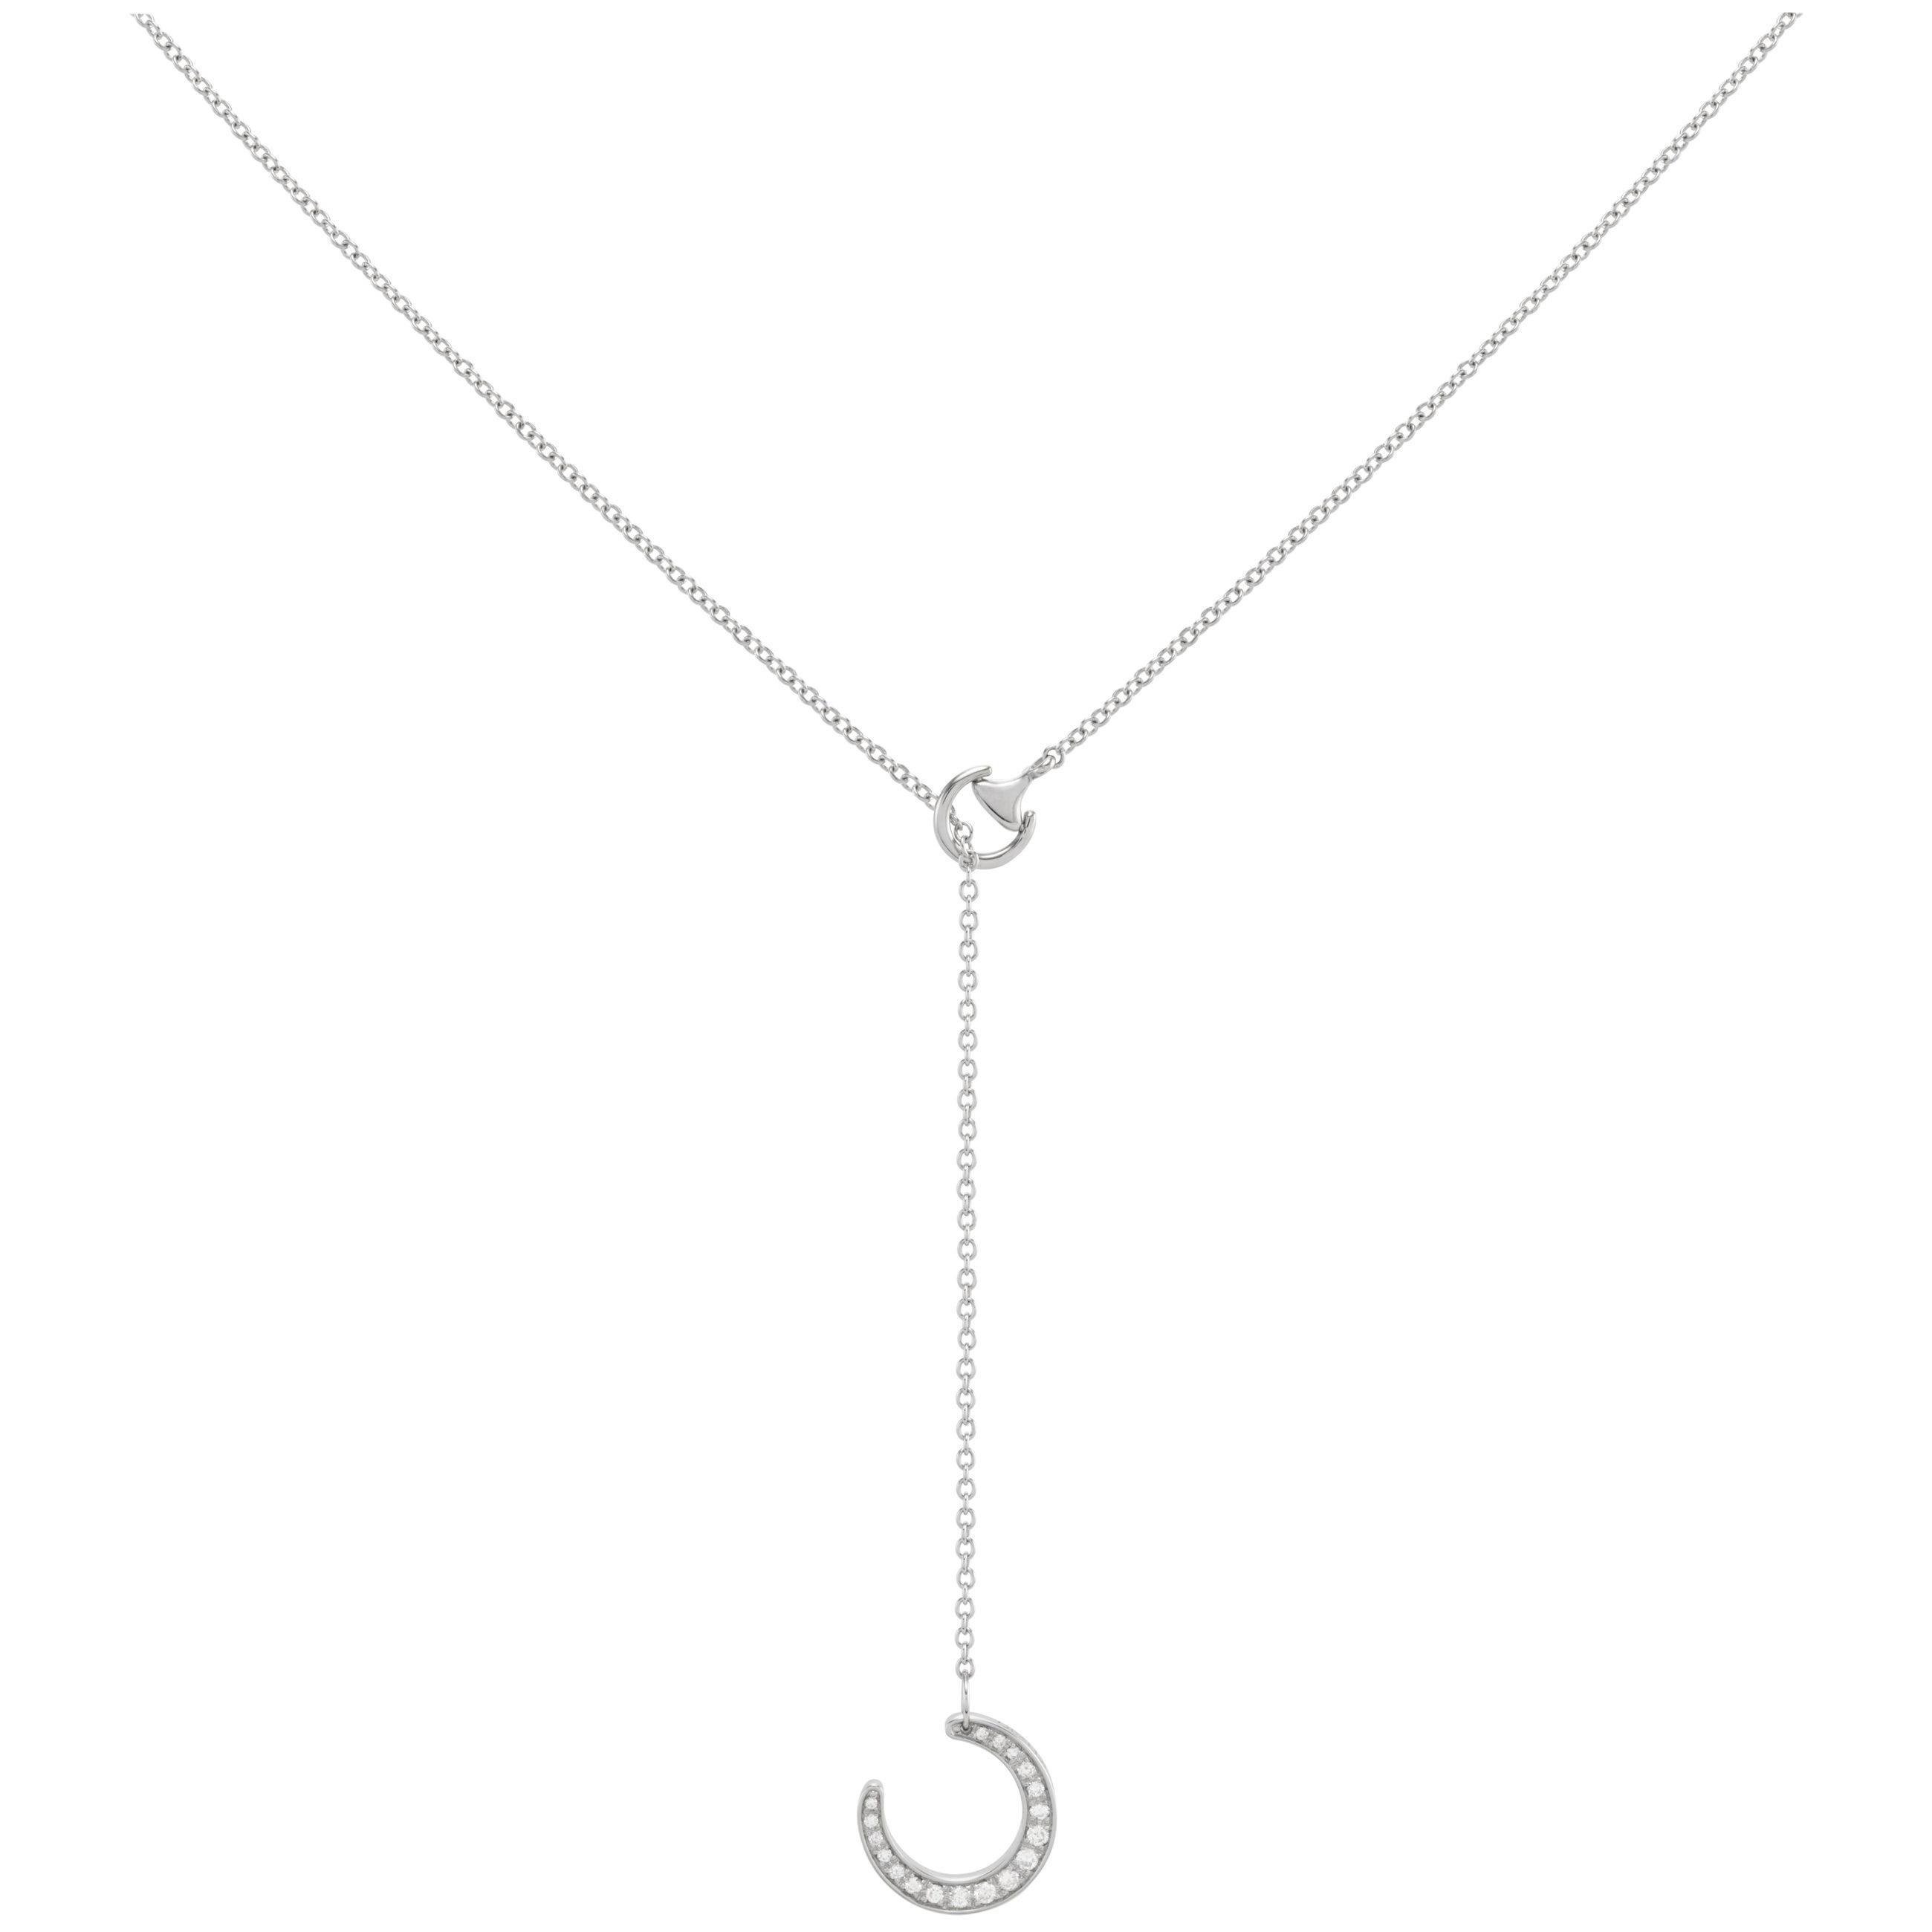 Ubaldi Gioielli 18k w- Gold Equestrian Horseshoe Necklace Pendant Diamonds Pave